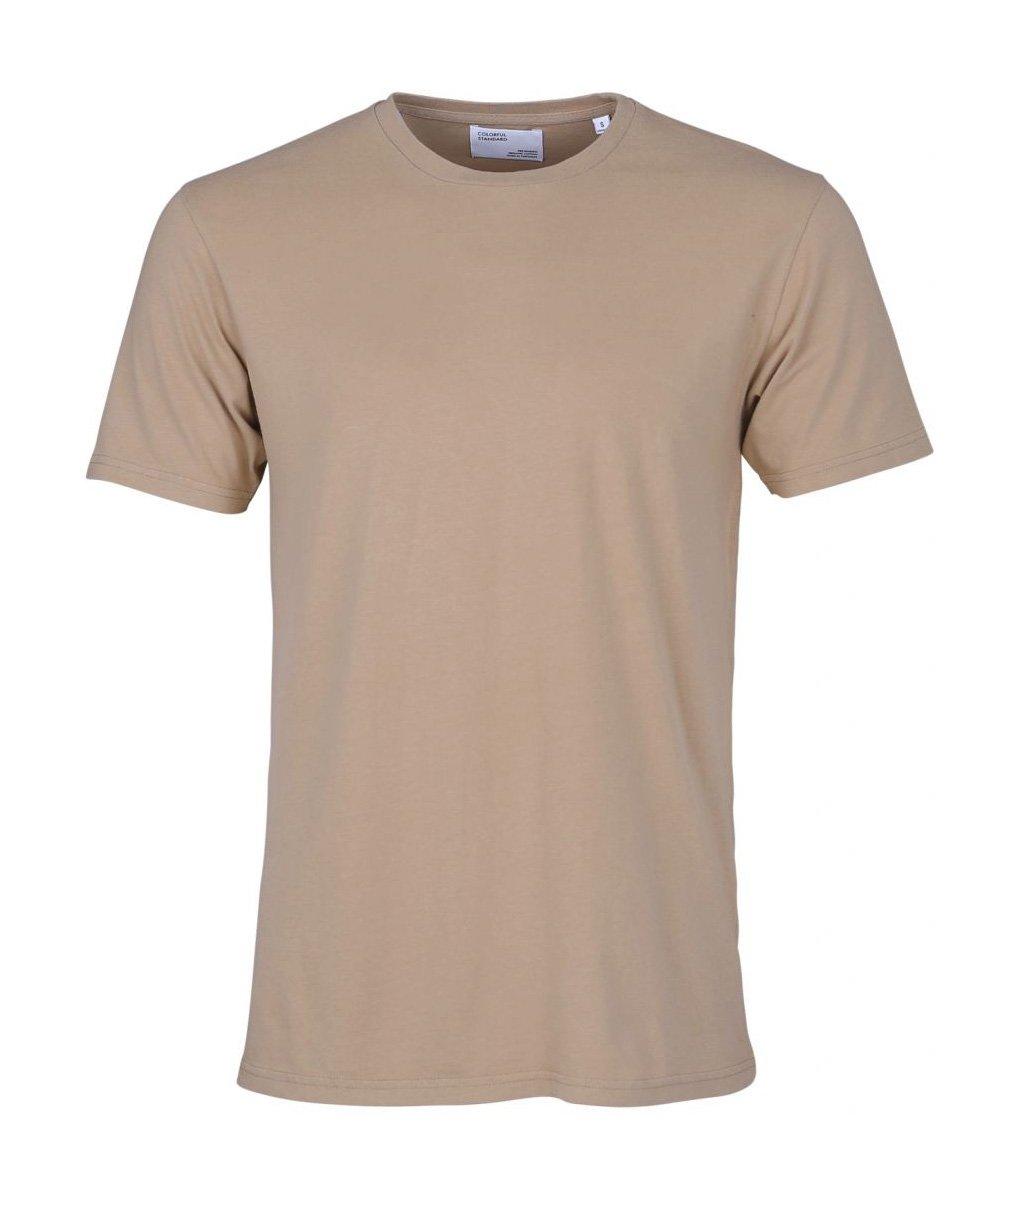 Colorful Standard COLORFUL STANDARD classic organic cotton tee shirt round neck khaki (unisex)